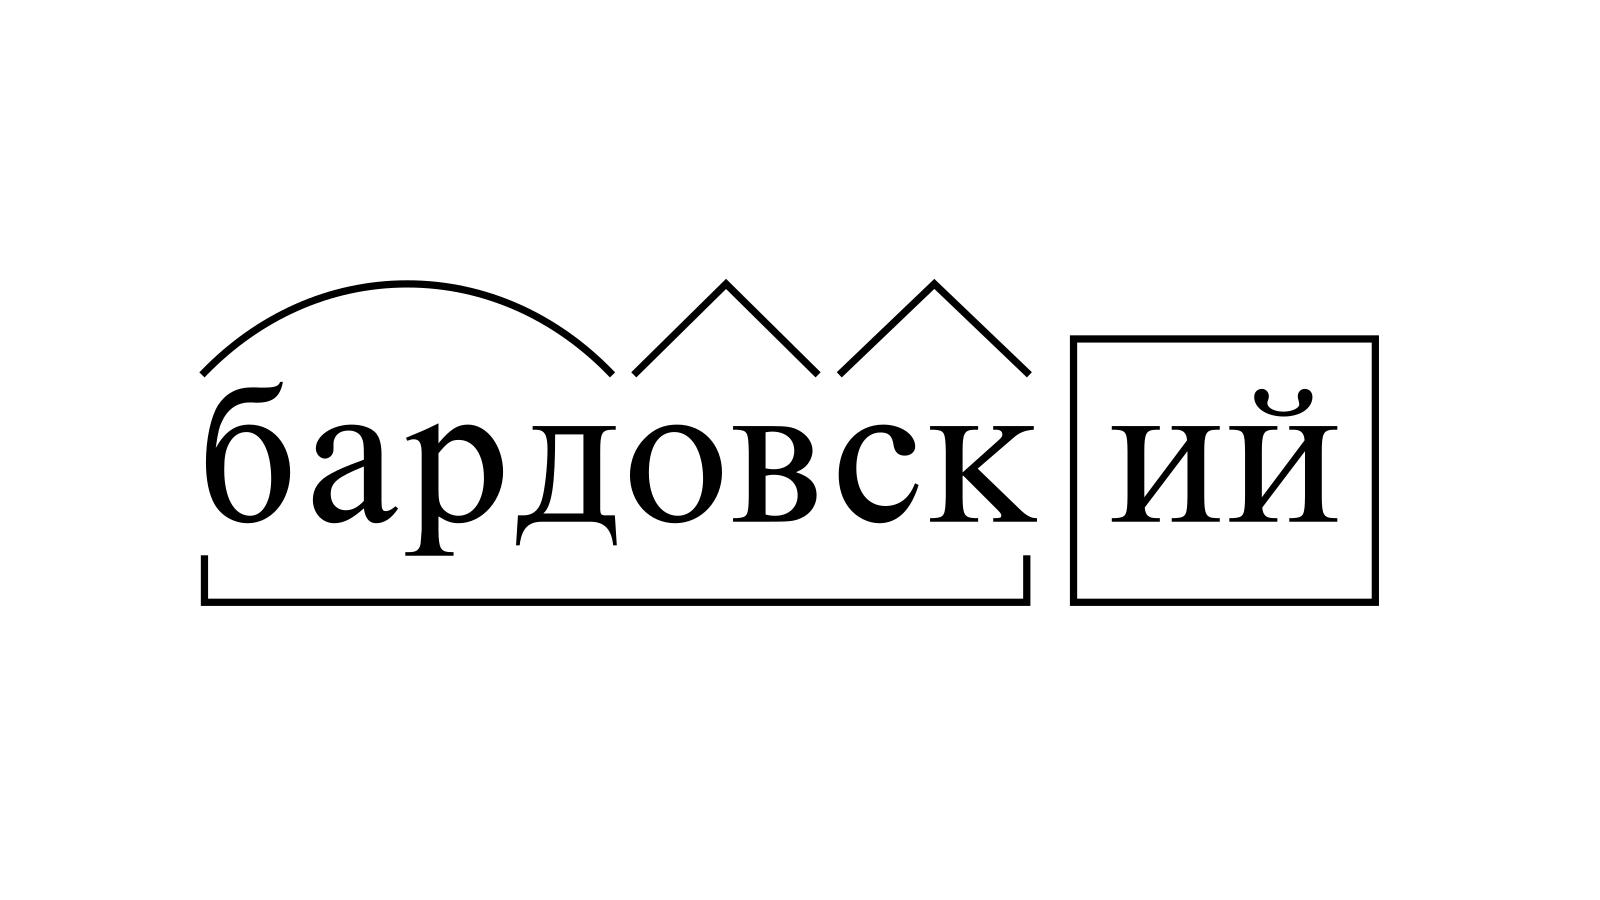 Разбор слова «бардовский» по составу